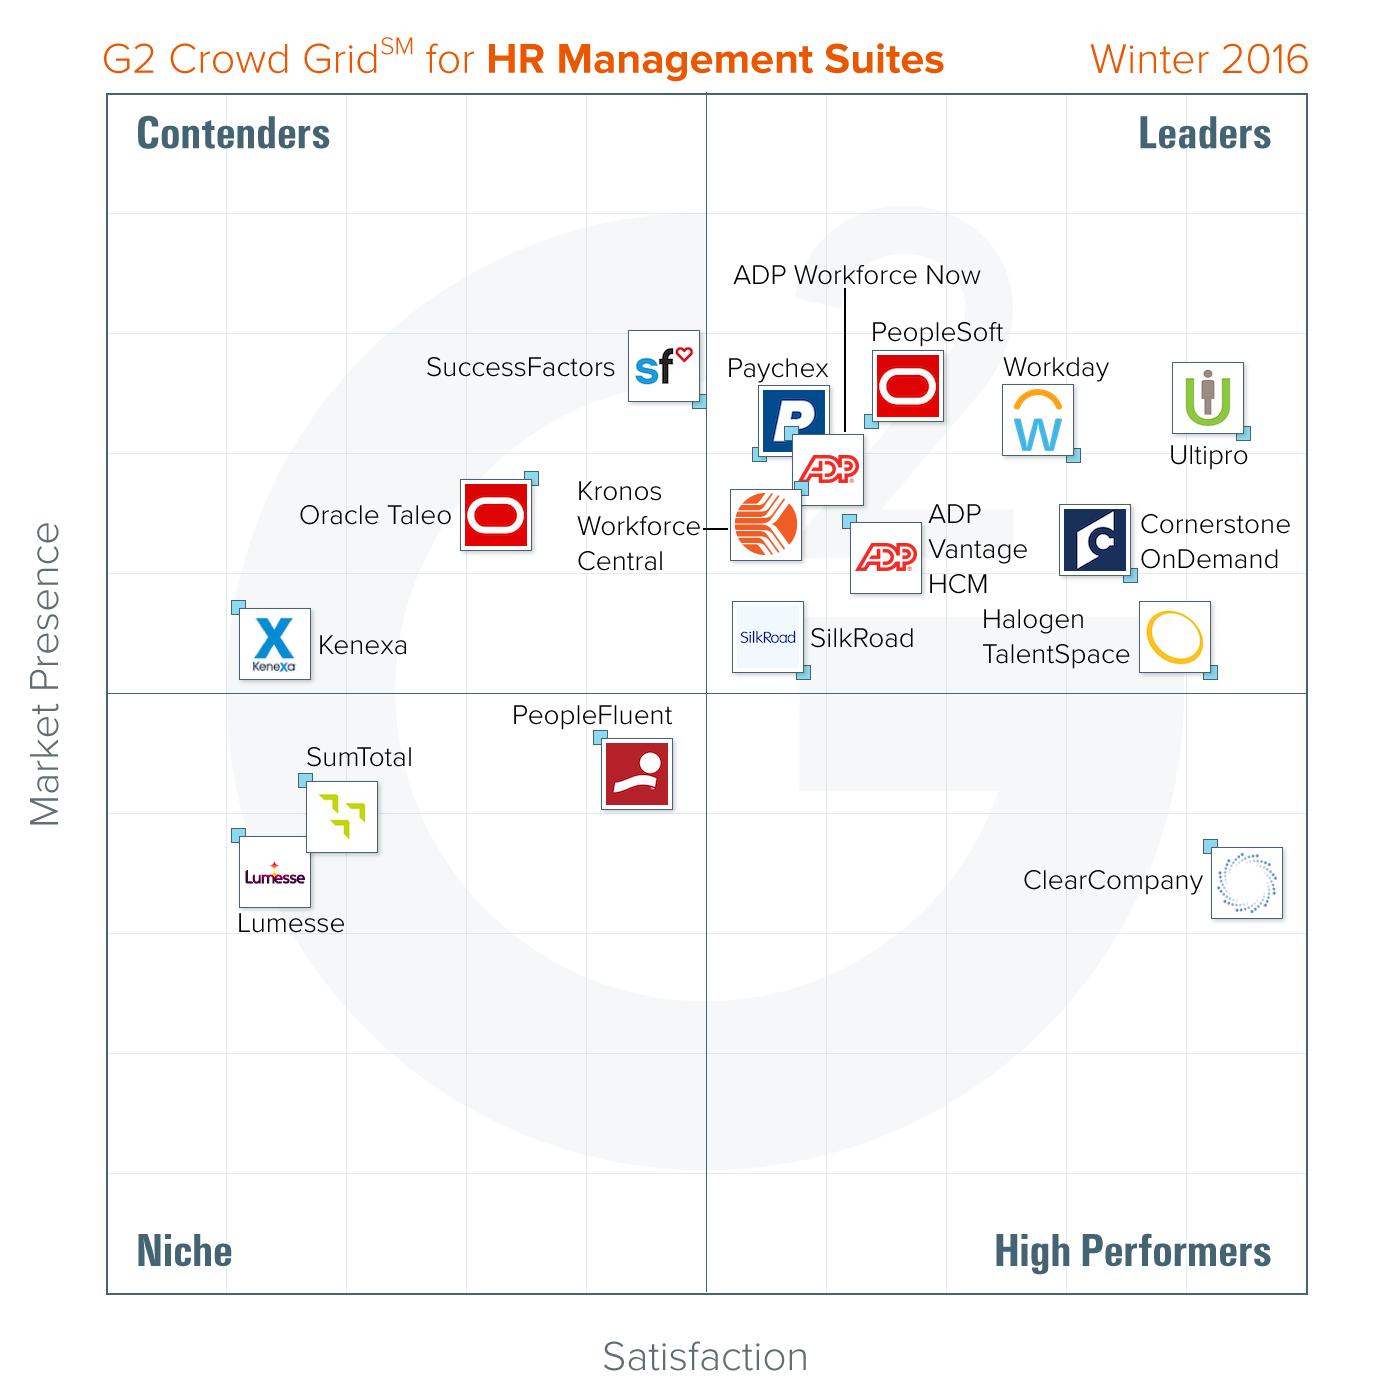 G2 Crowd Grid for HR Management Suites